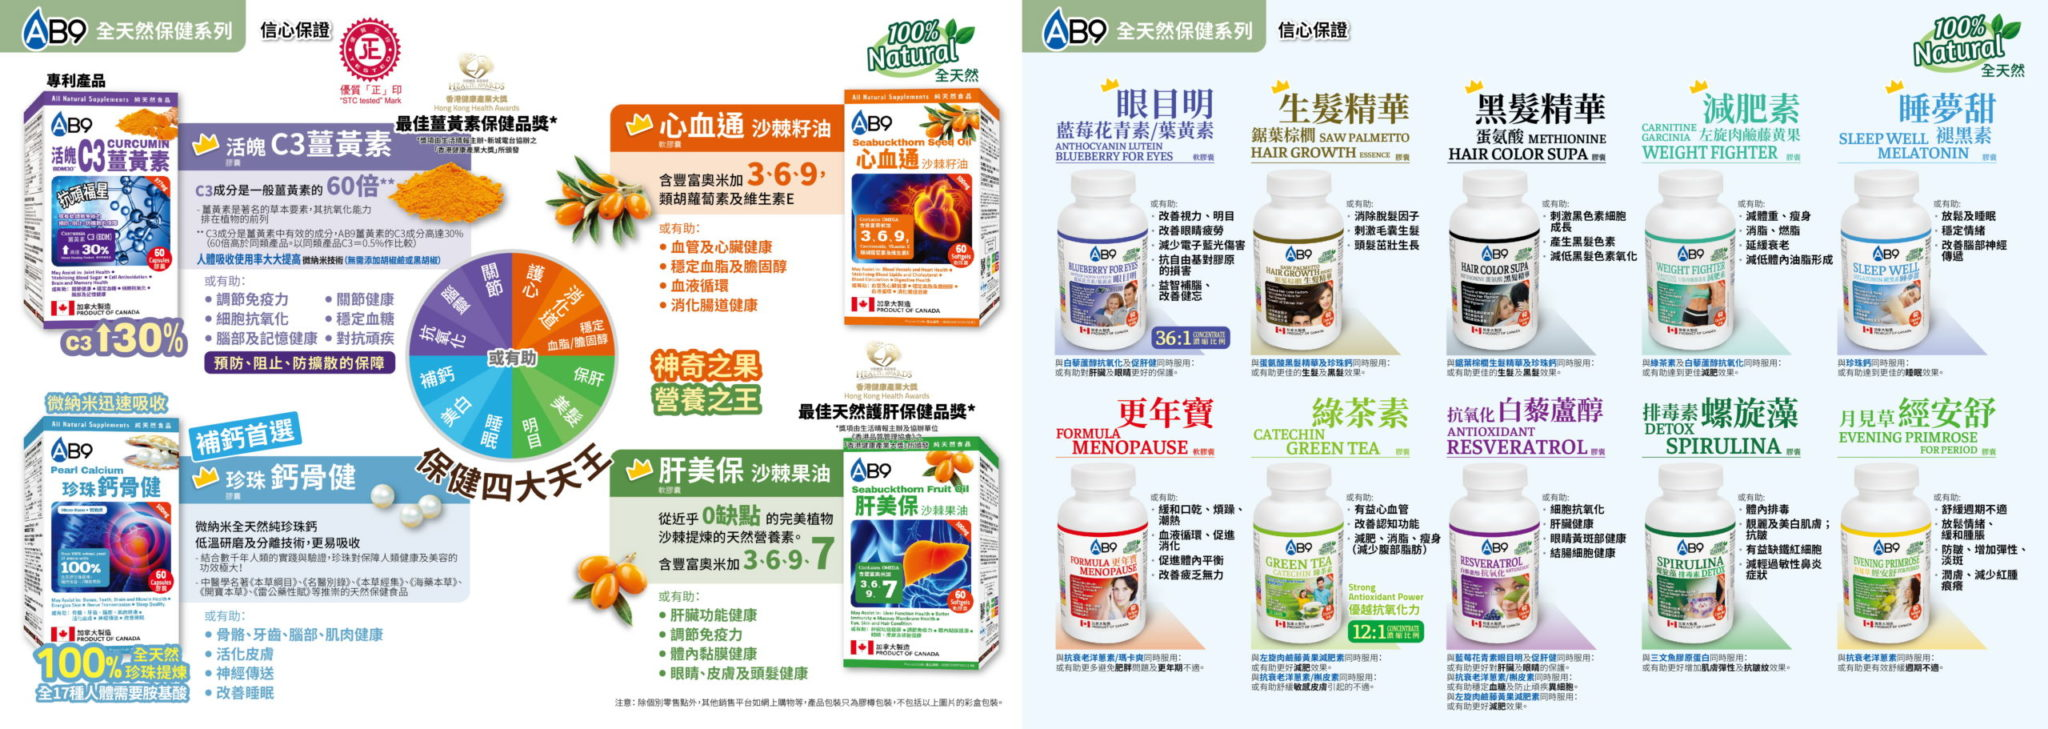 ab9_catalog_02